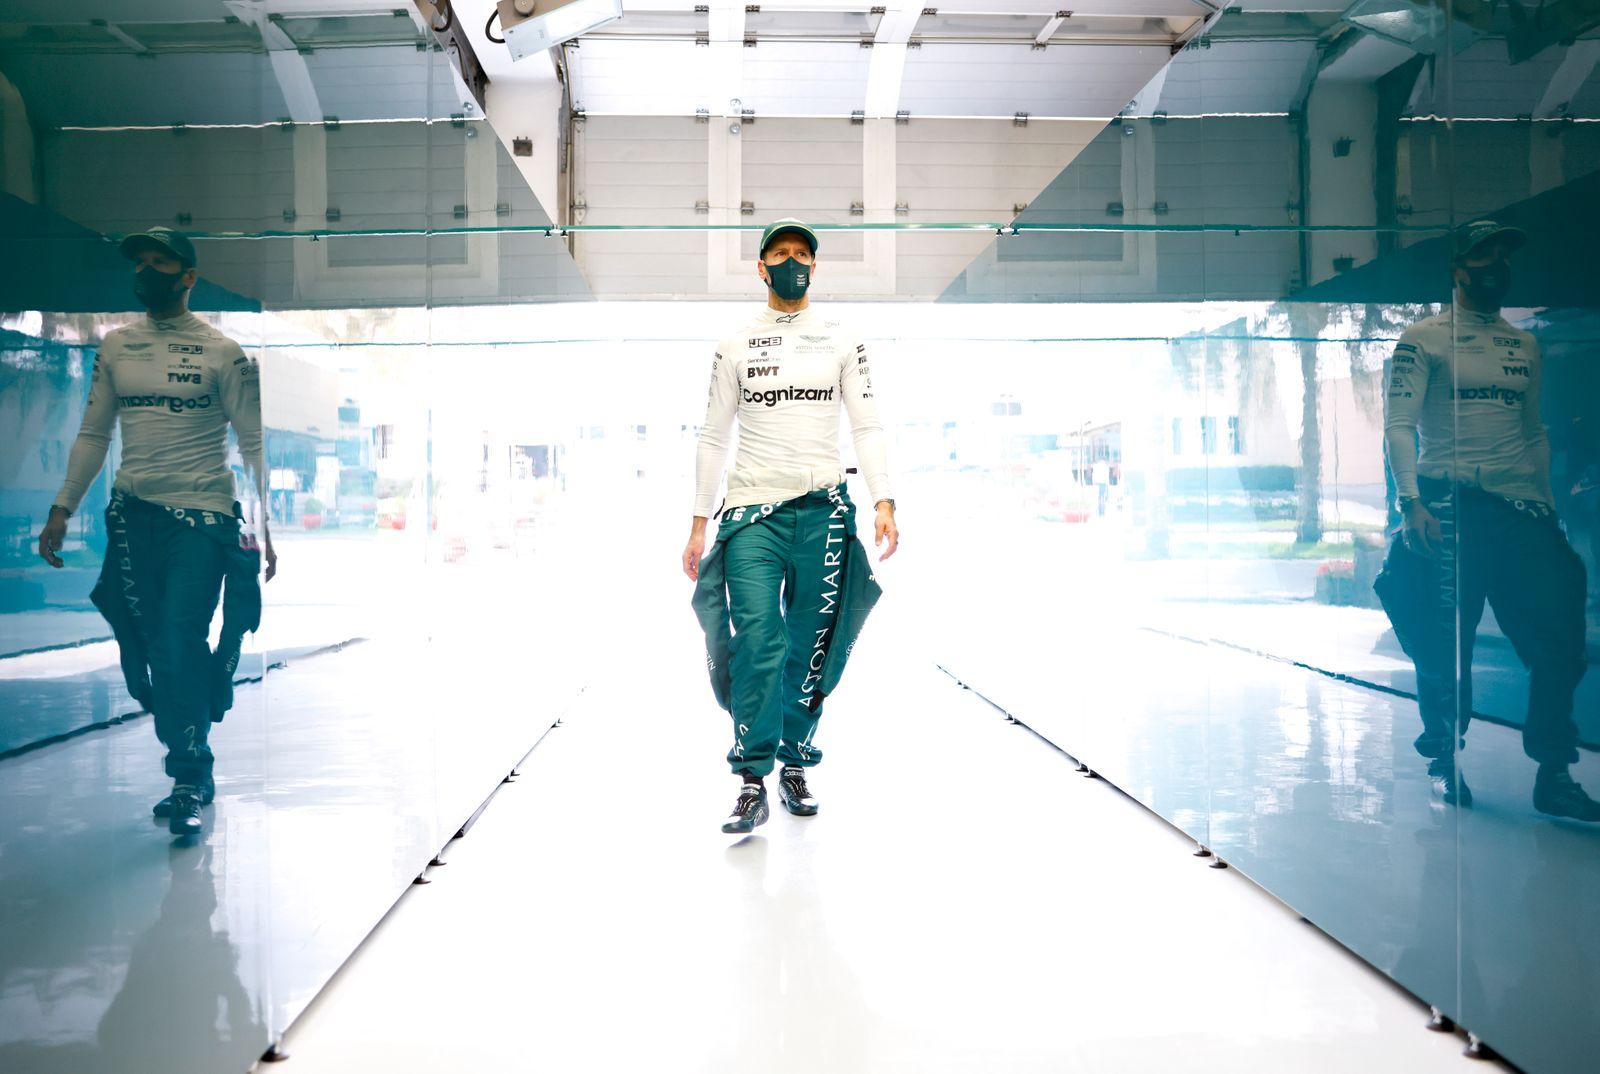 Formula 1 2021: Bahrain March testing BAHRAIN INTERNATIONAL CIRCUIT, BAHRAIN - MARCH 11: Sebastian Vettel, Aston Martin